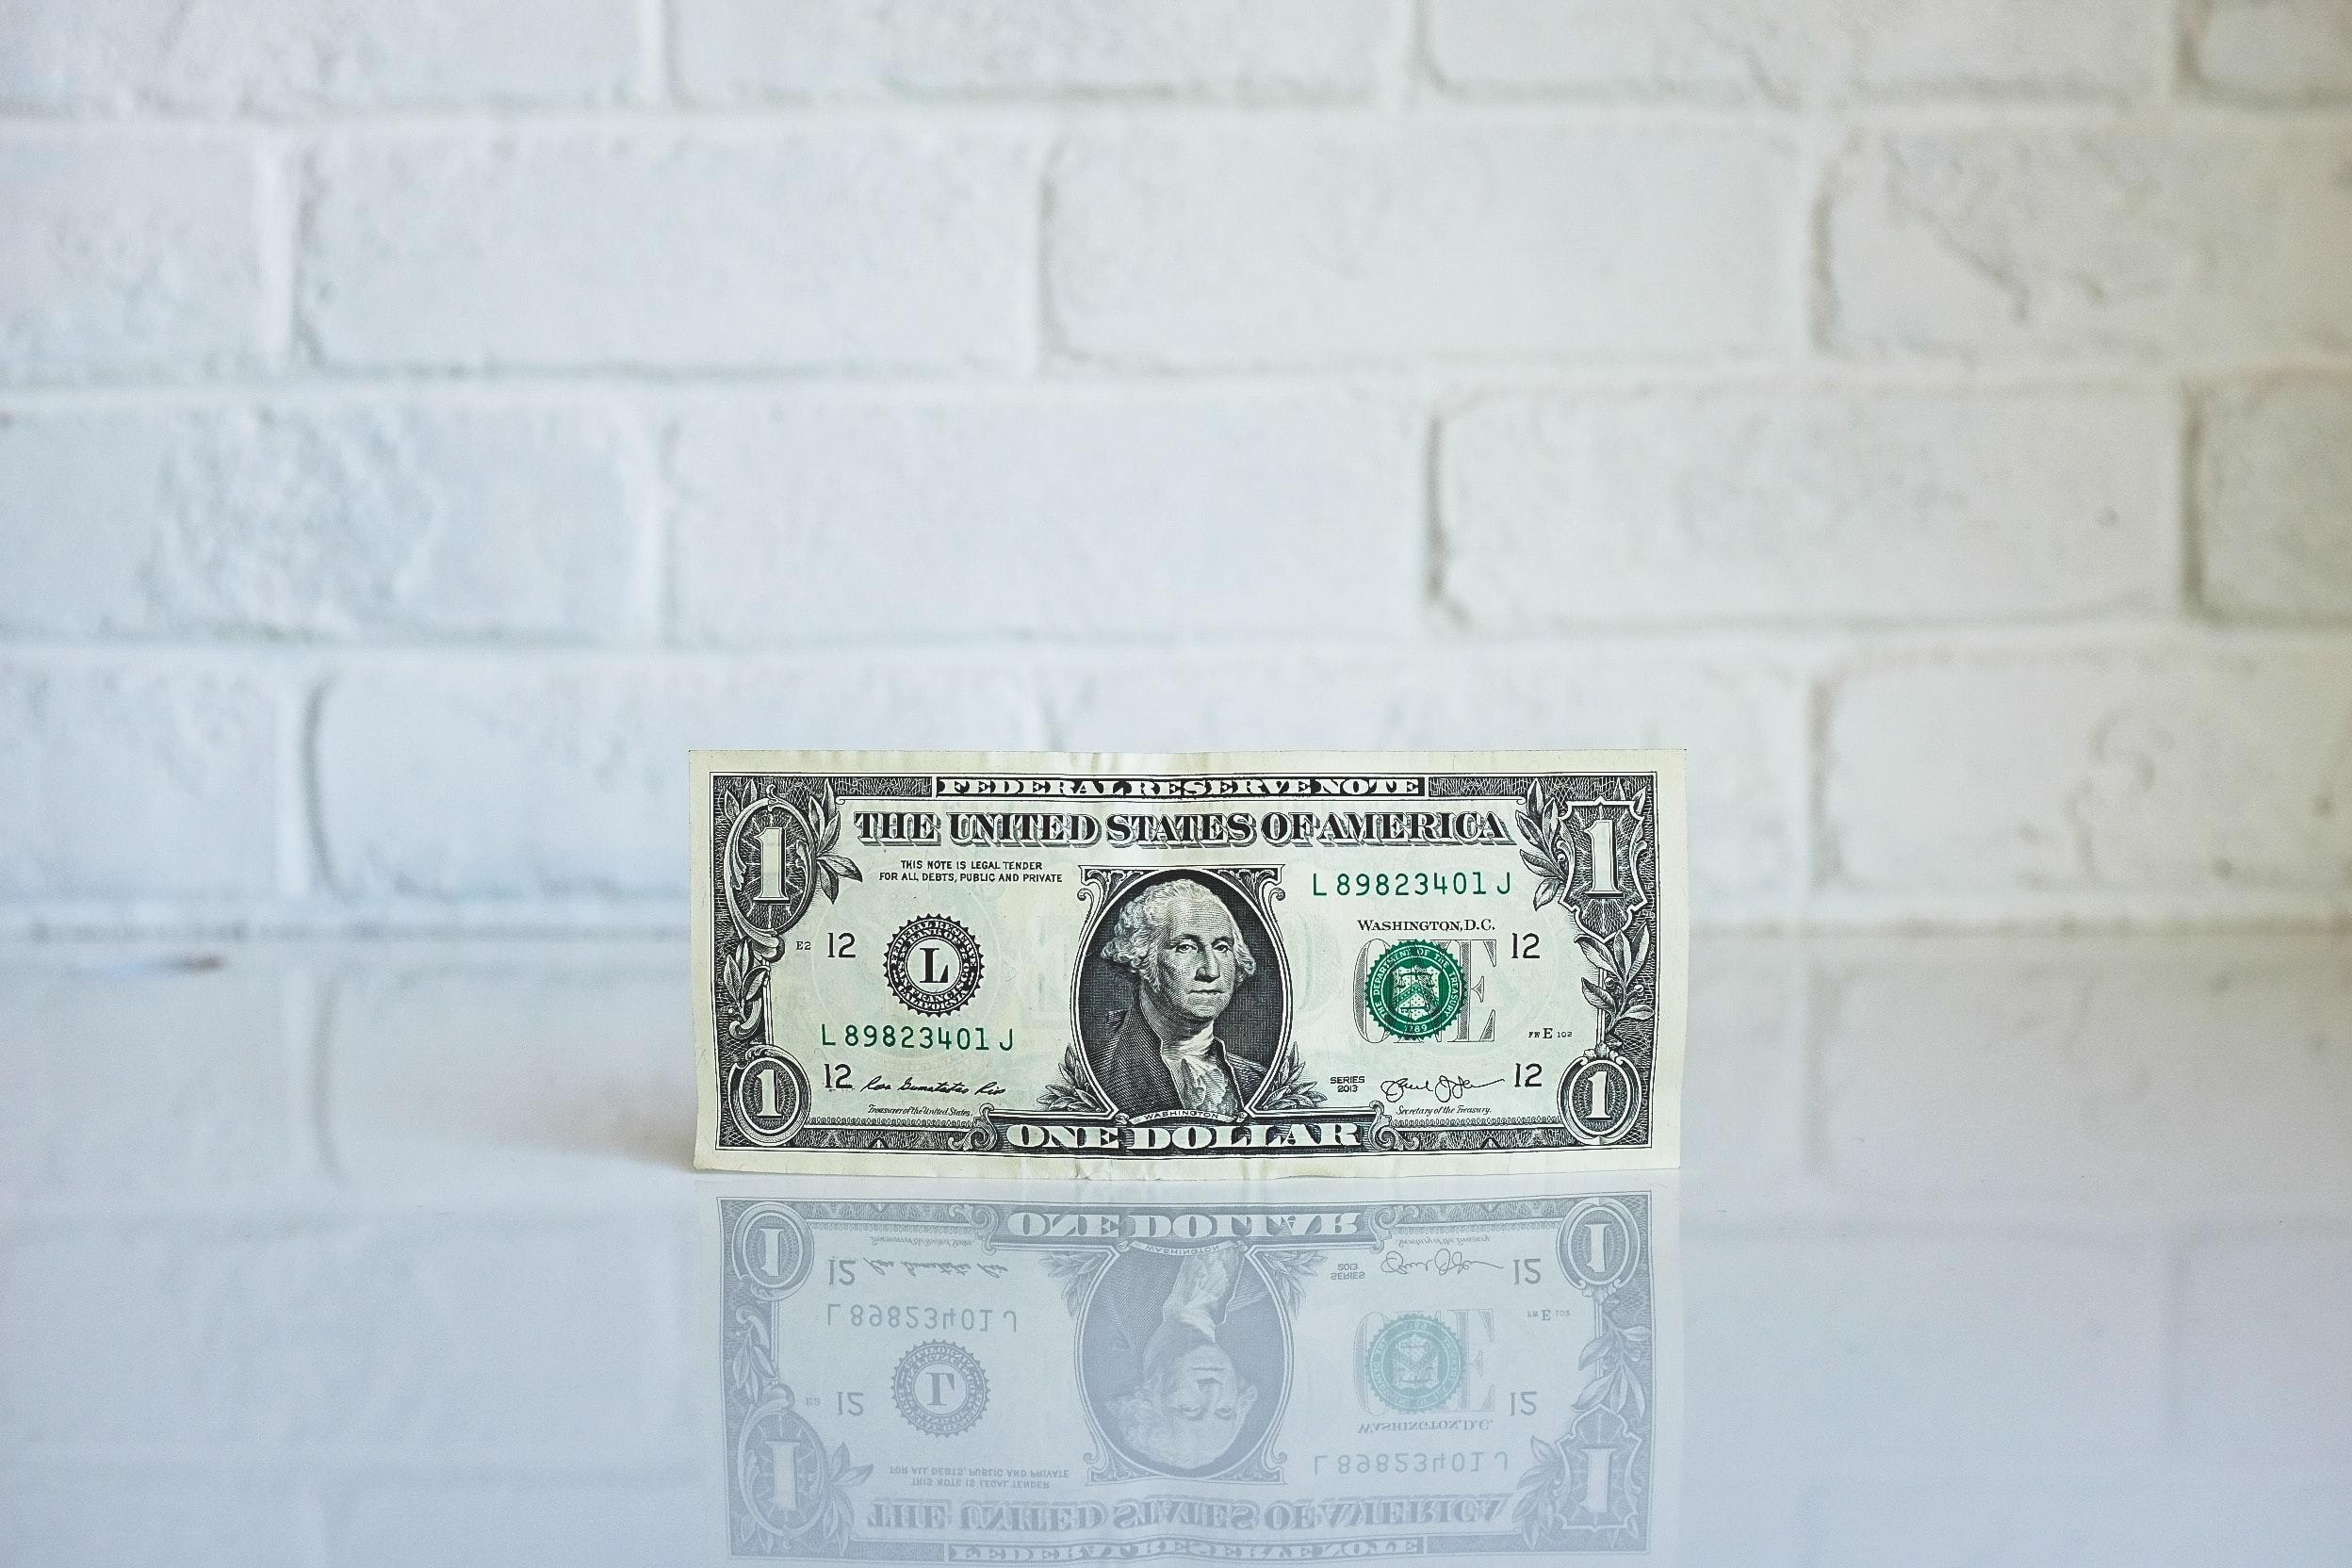 Dollar Bill | Photo by NeONBRAND on Unsplash